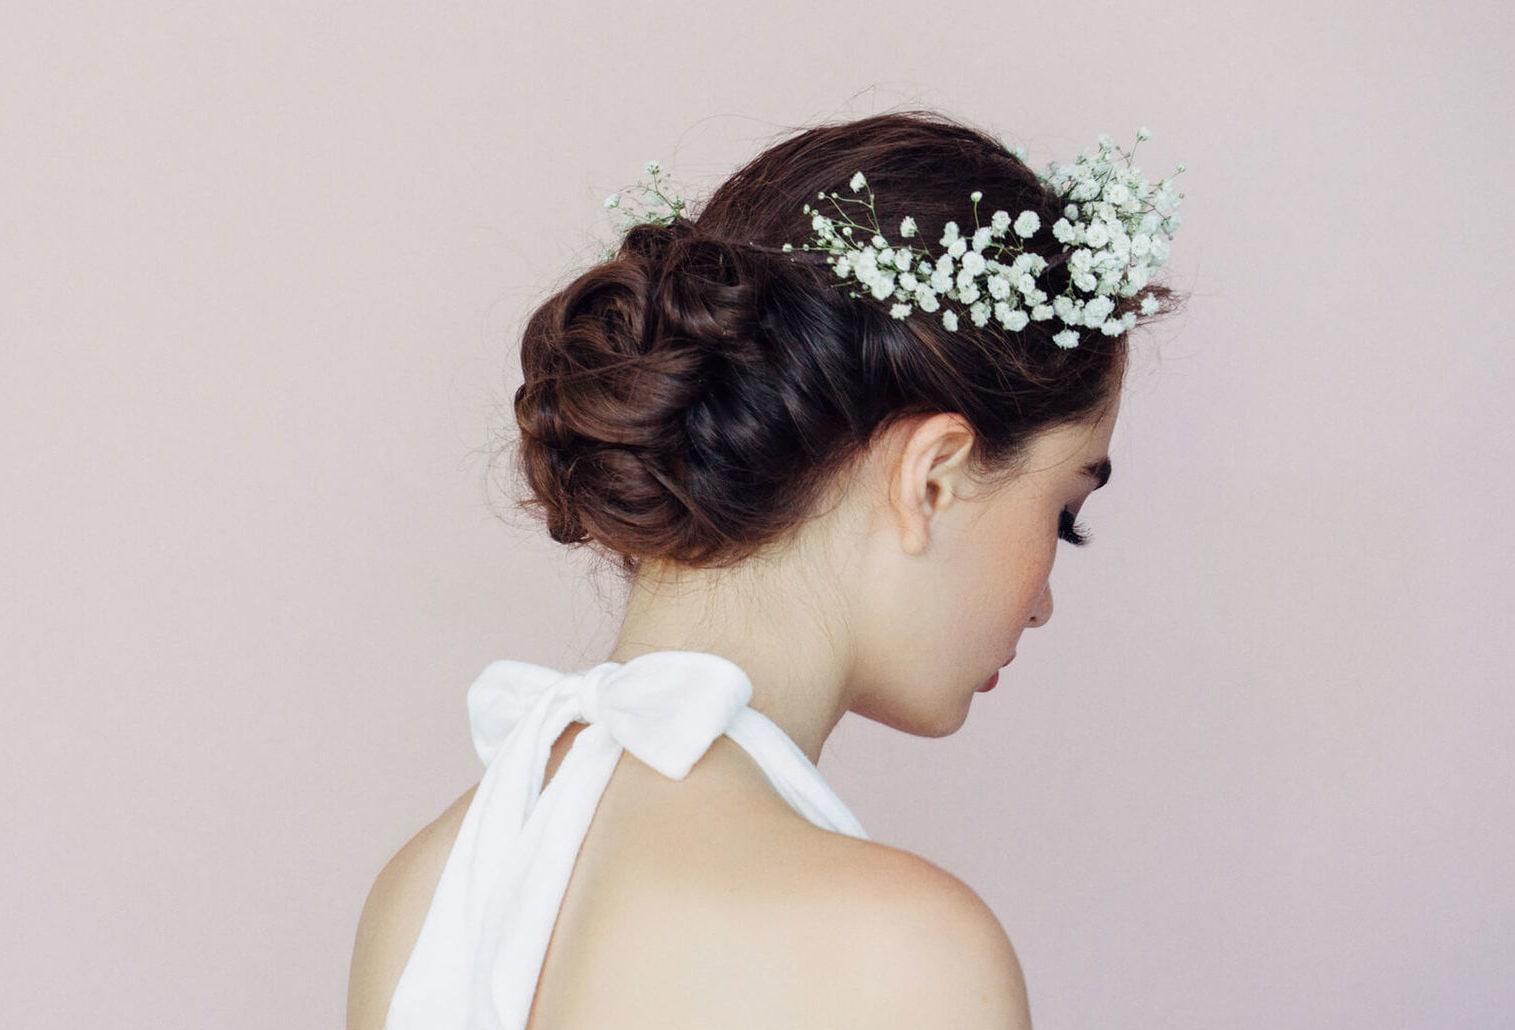 peinados para boda de noche nudo enredado